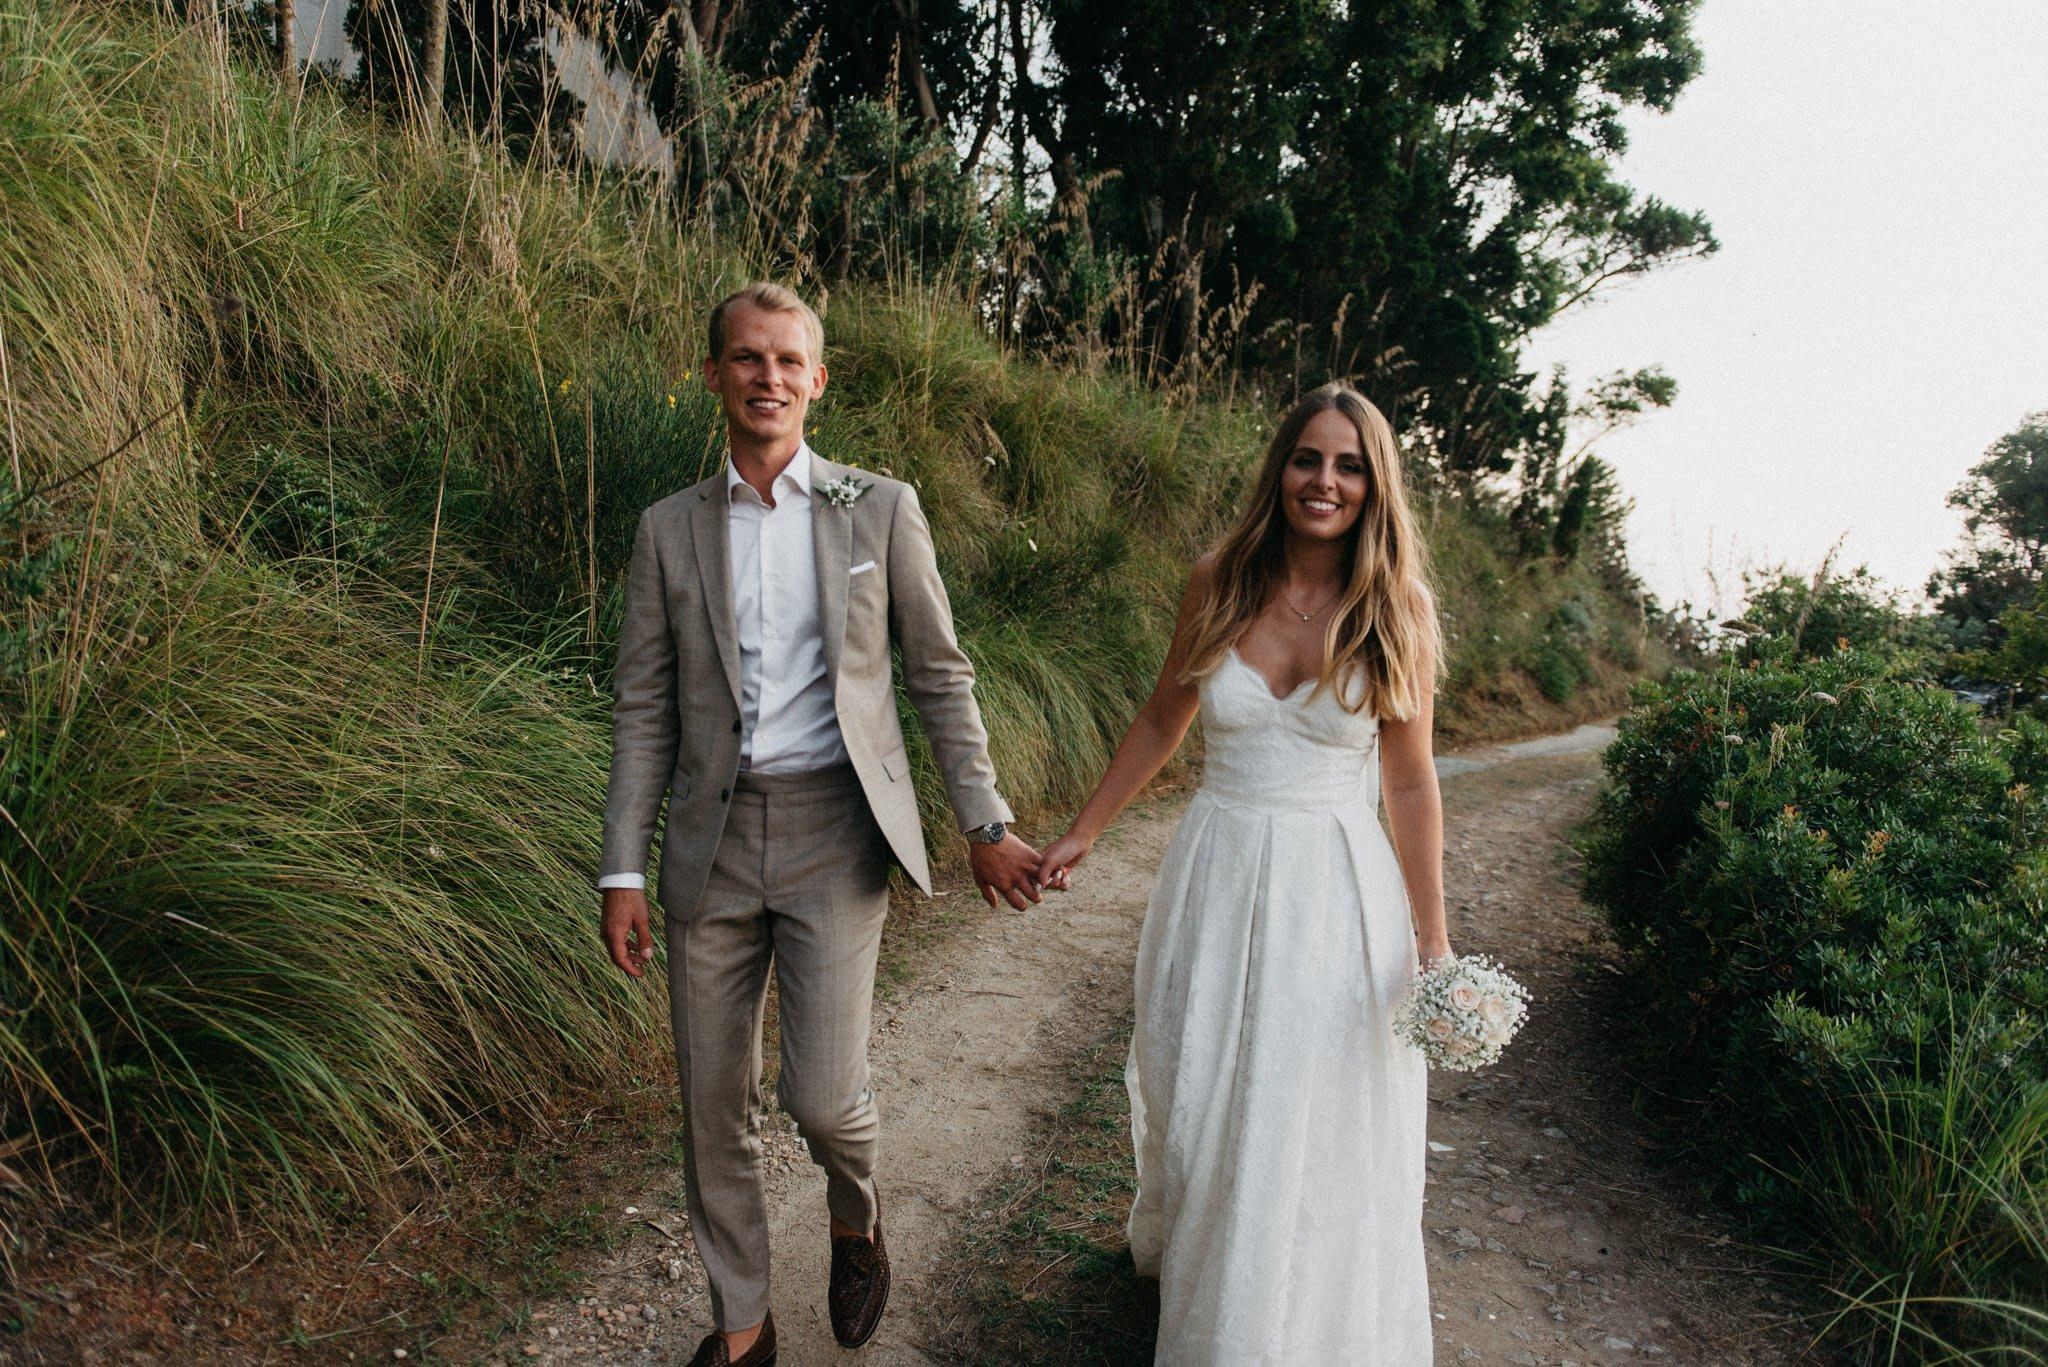 Hochzeit in Italien am Capo Vaticano